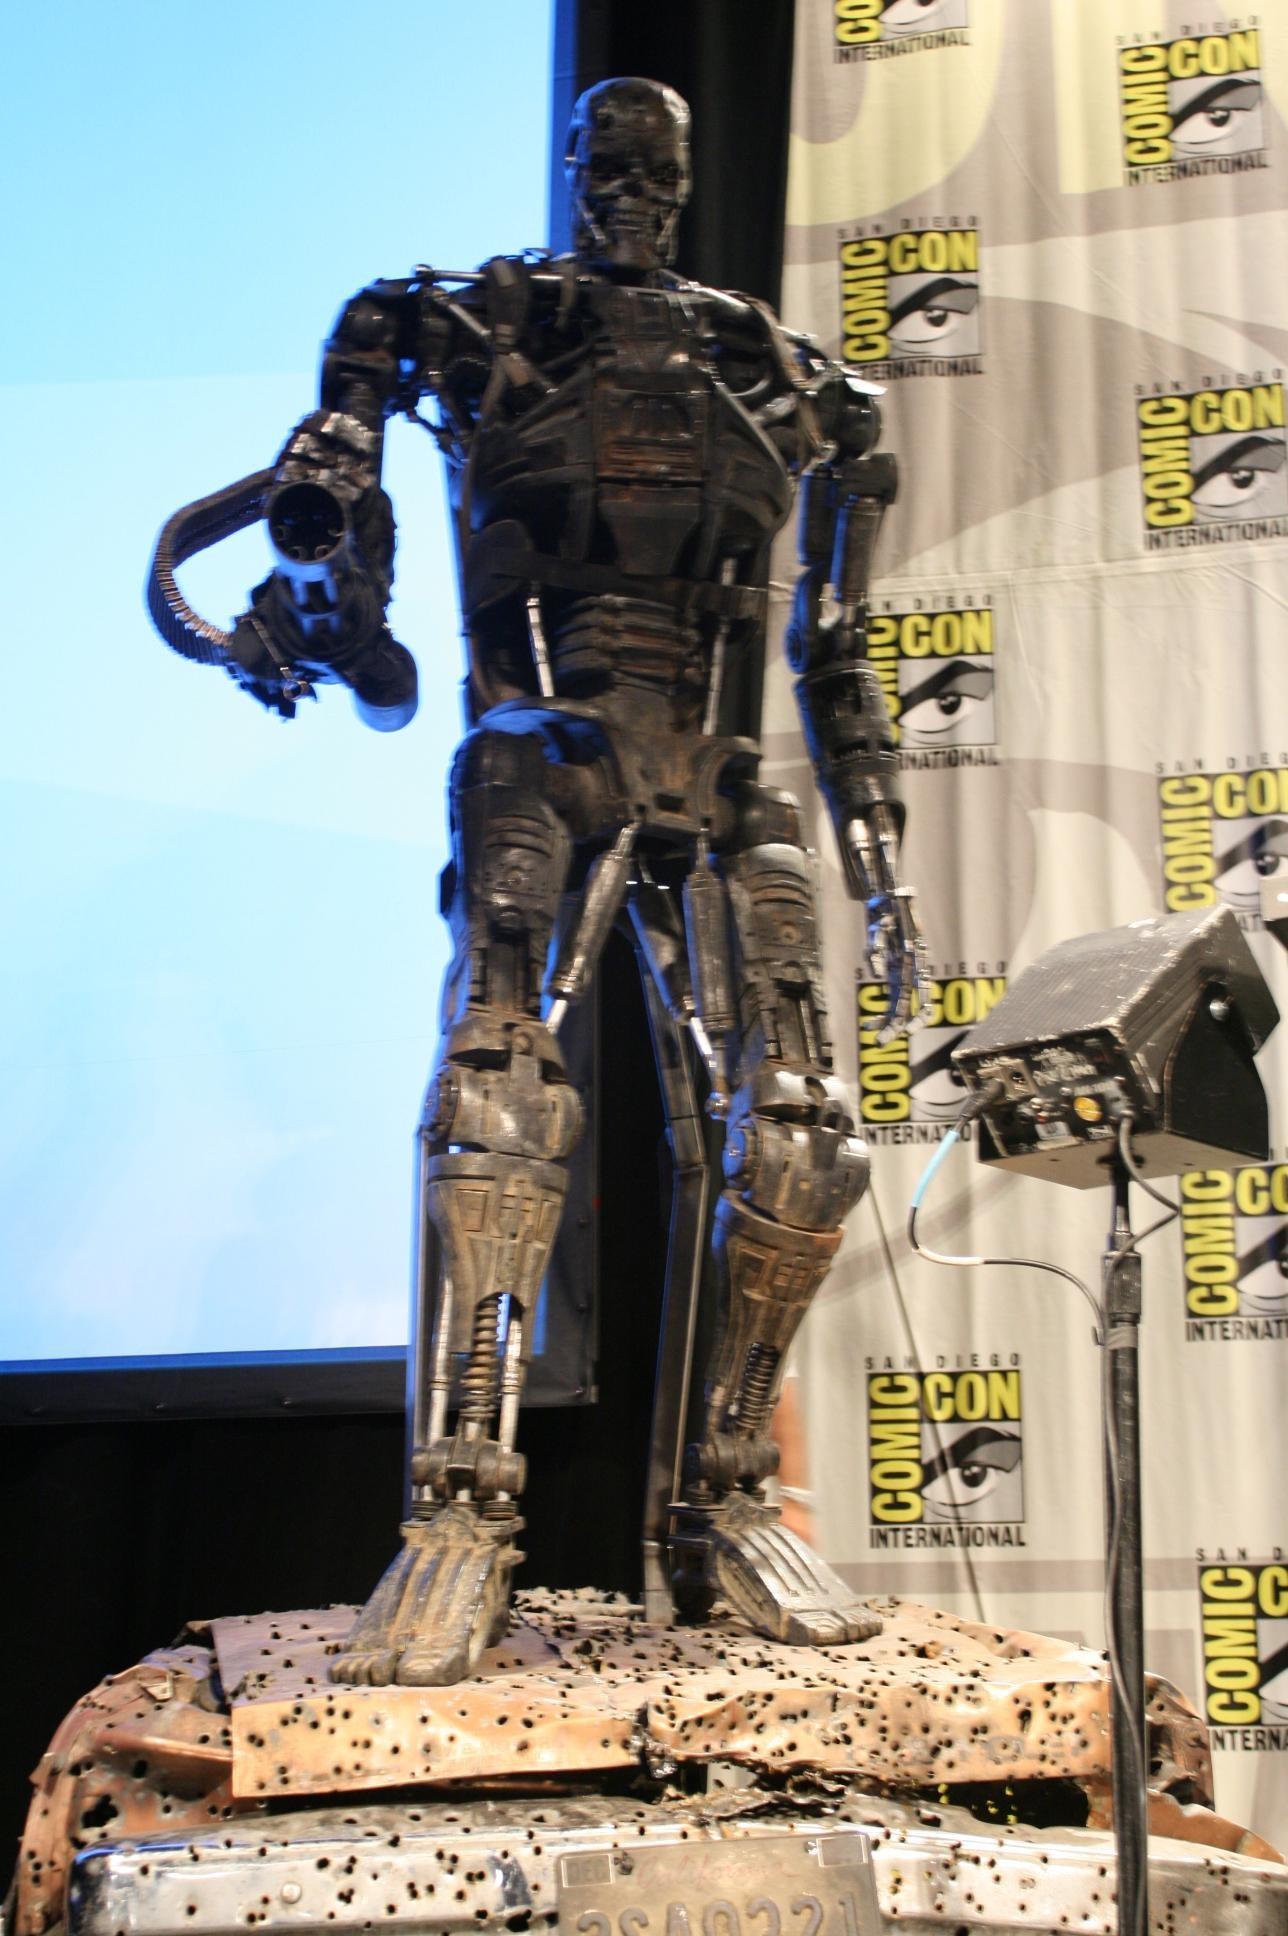 Terminator 4 Trailer